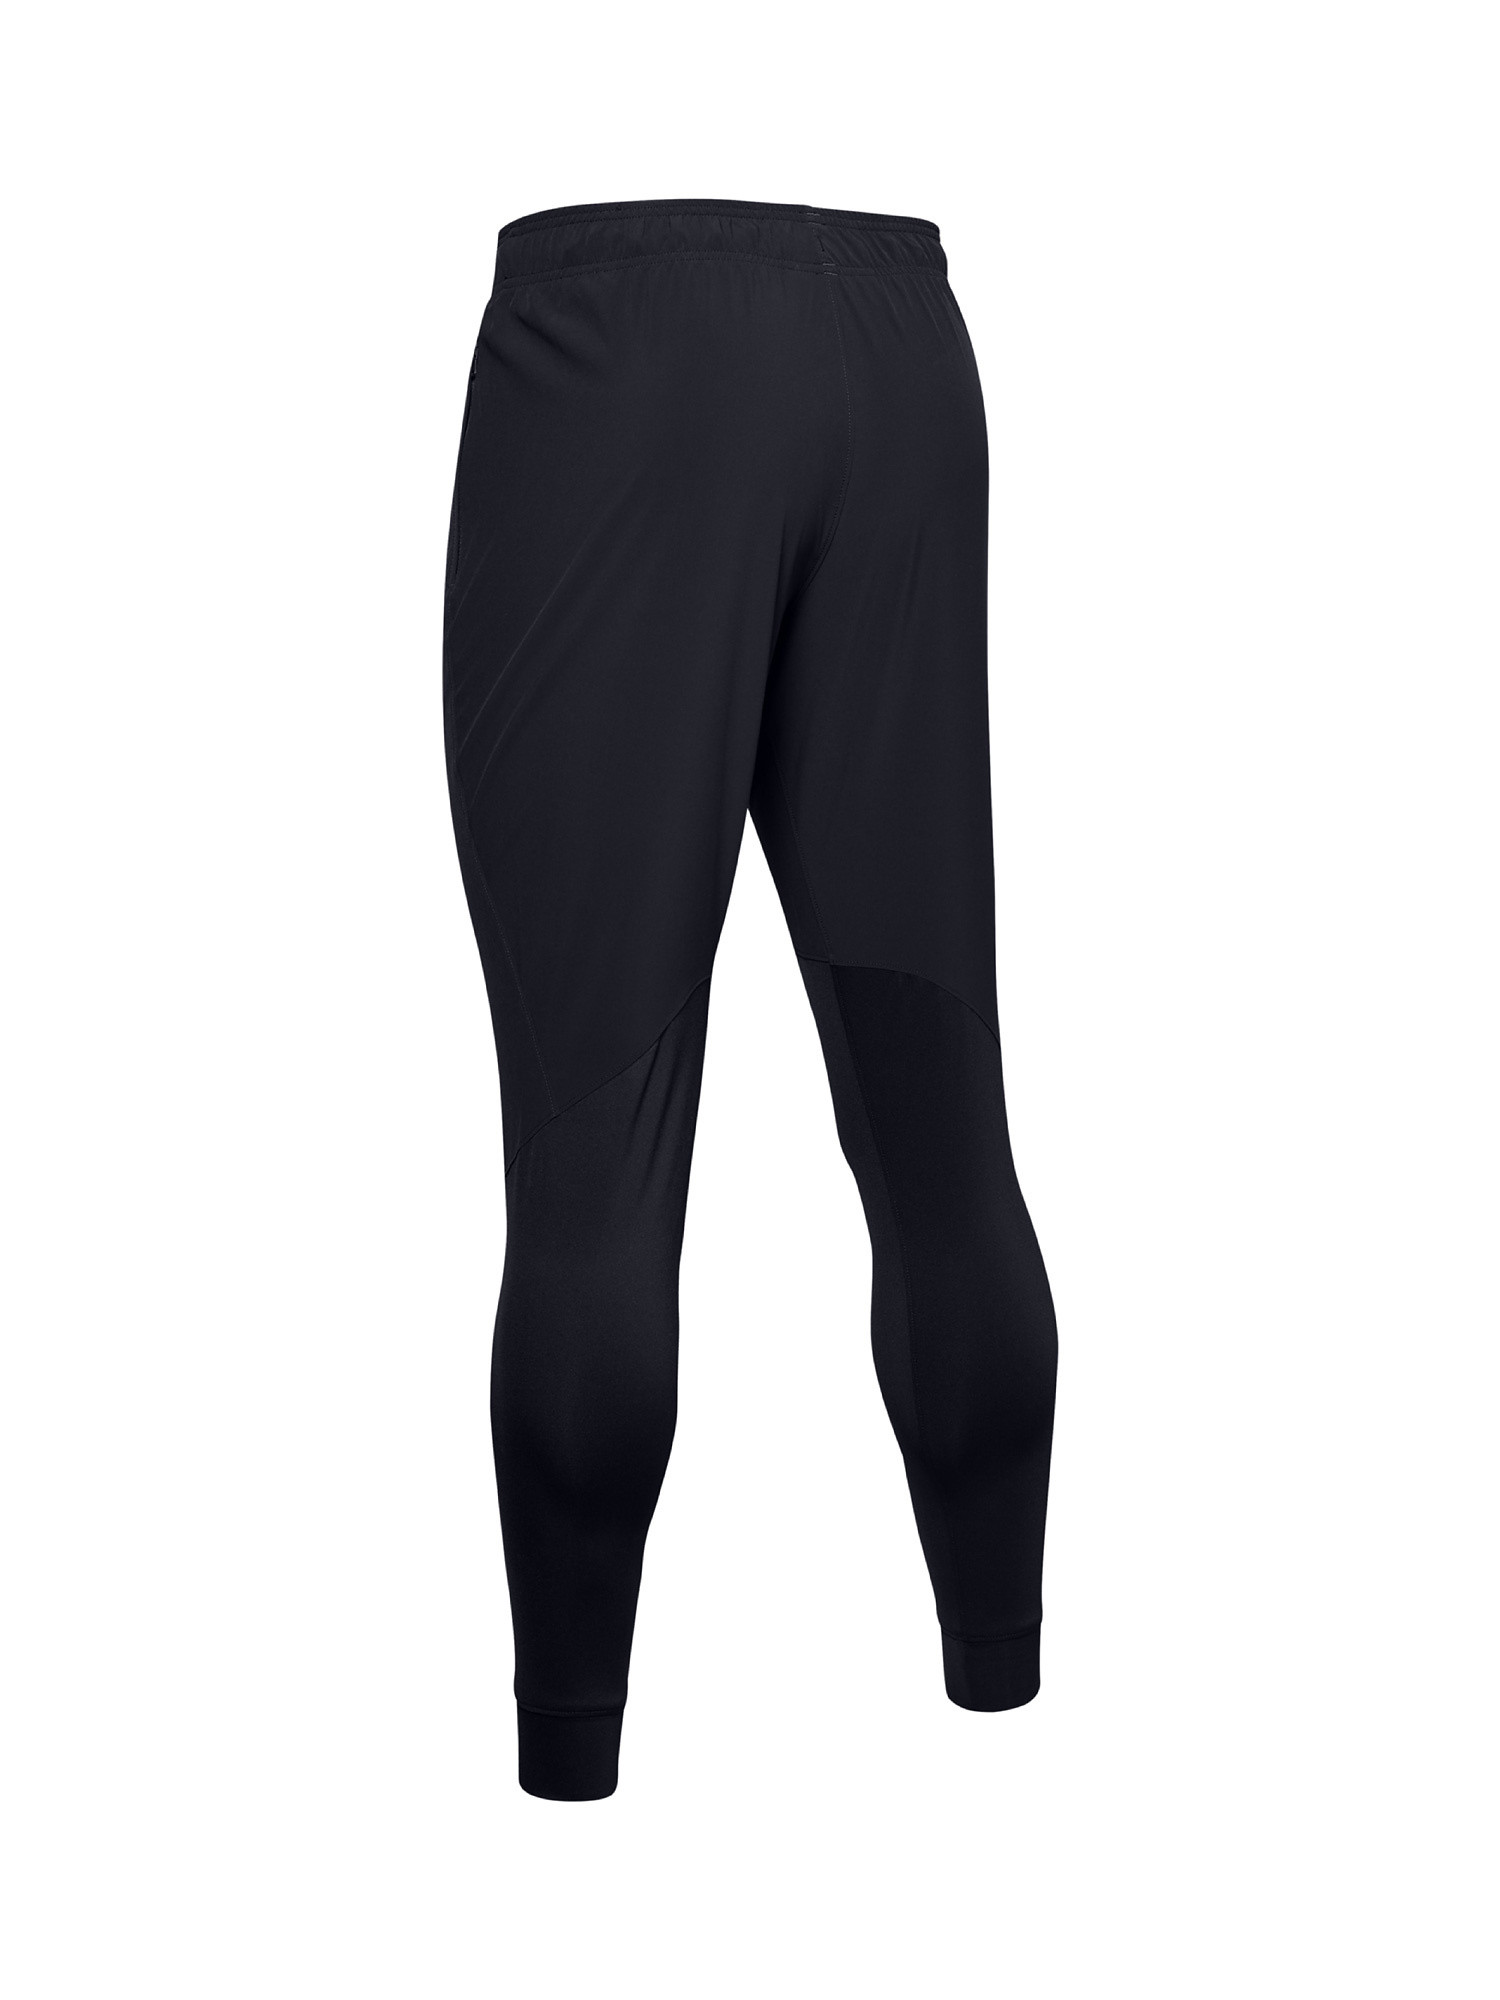 Pantaloni sportivi, Nero, large image number 1